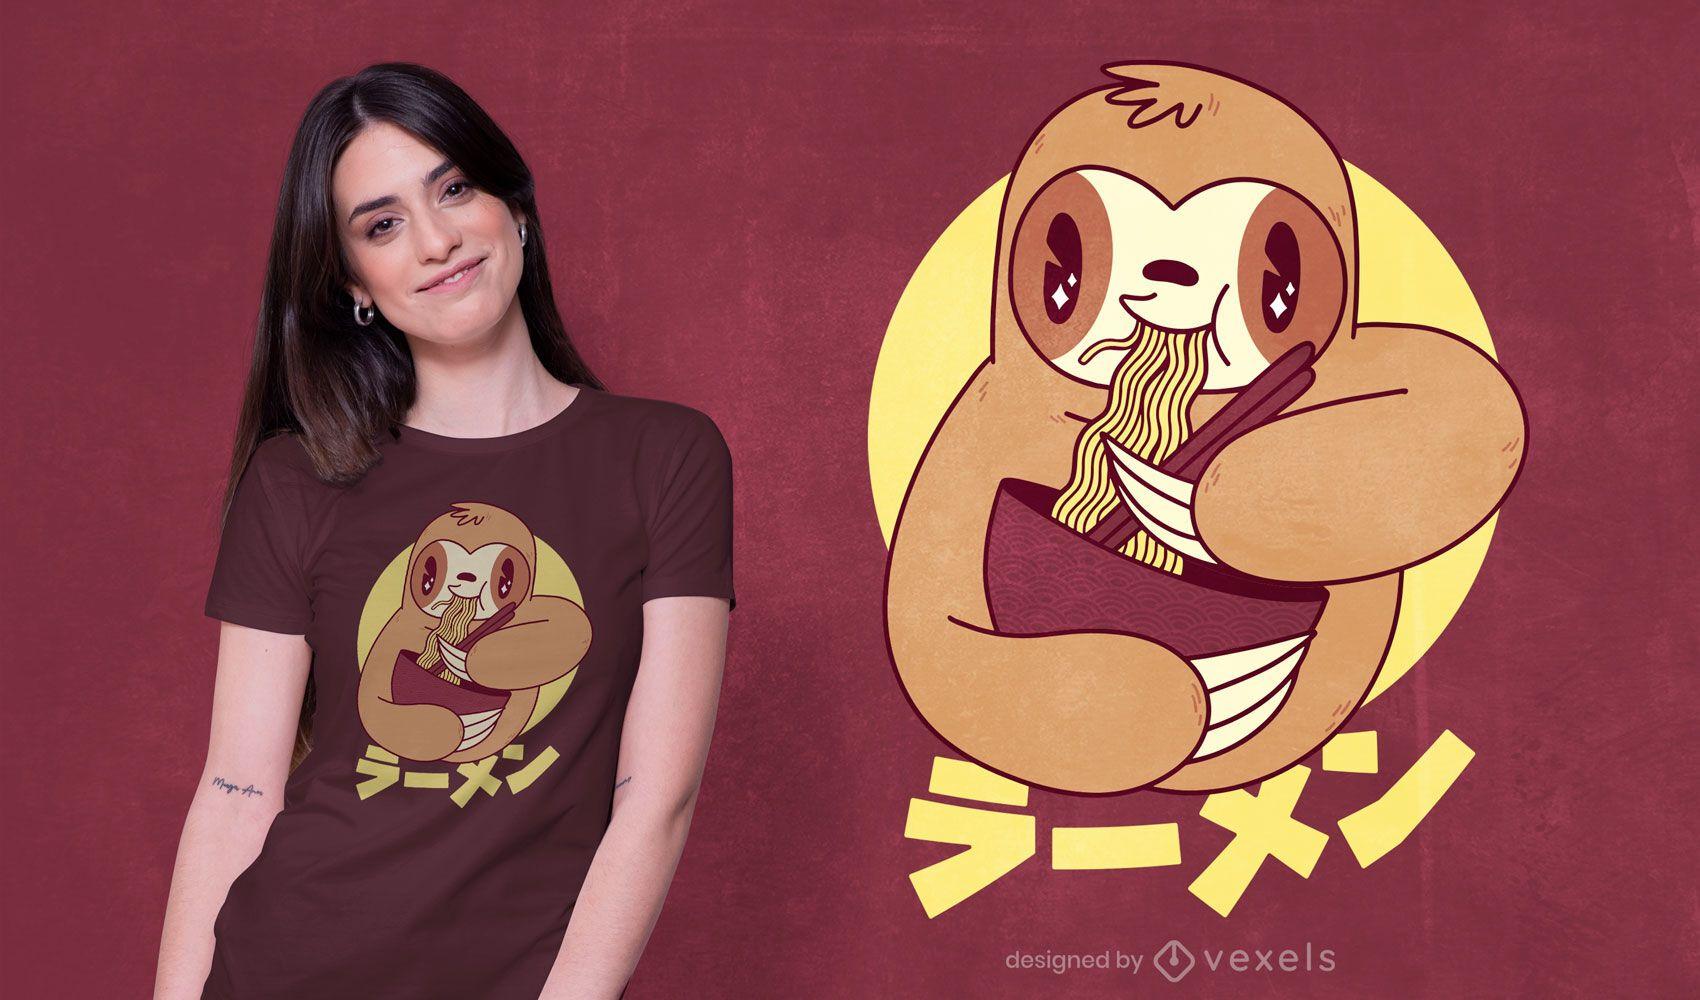 Ramen sloth t-shirt design